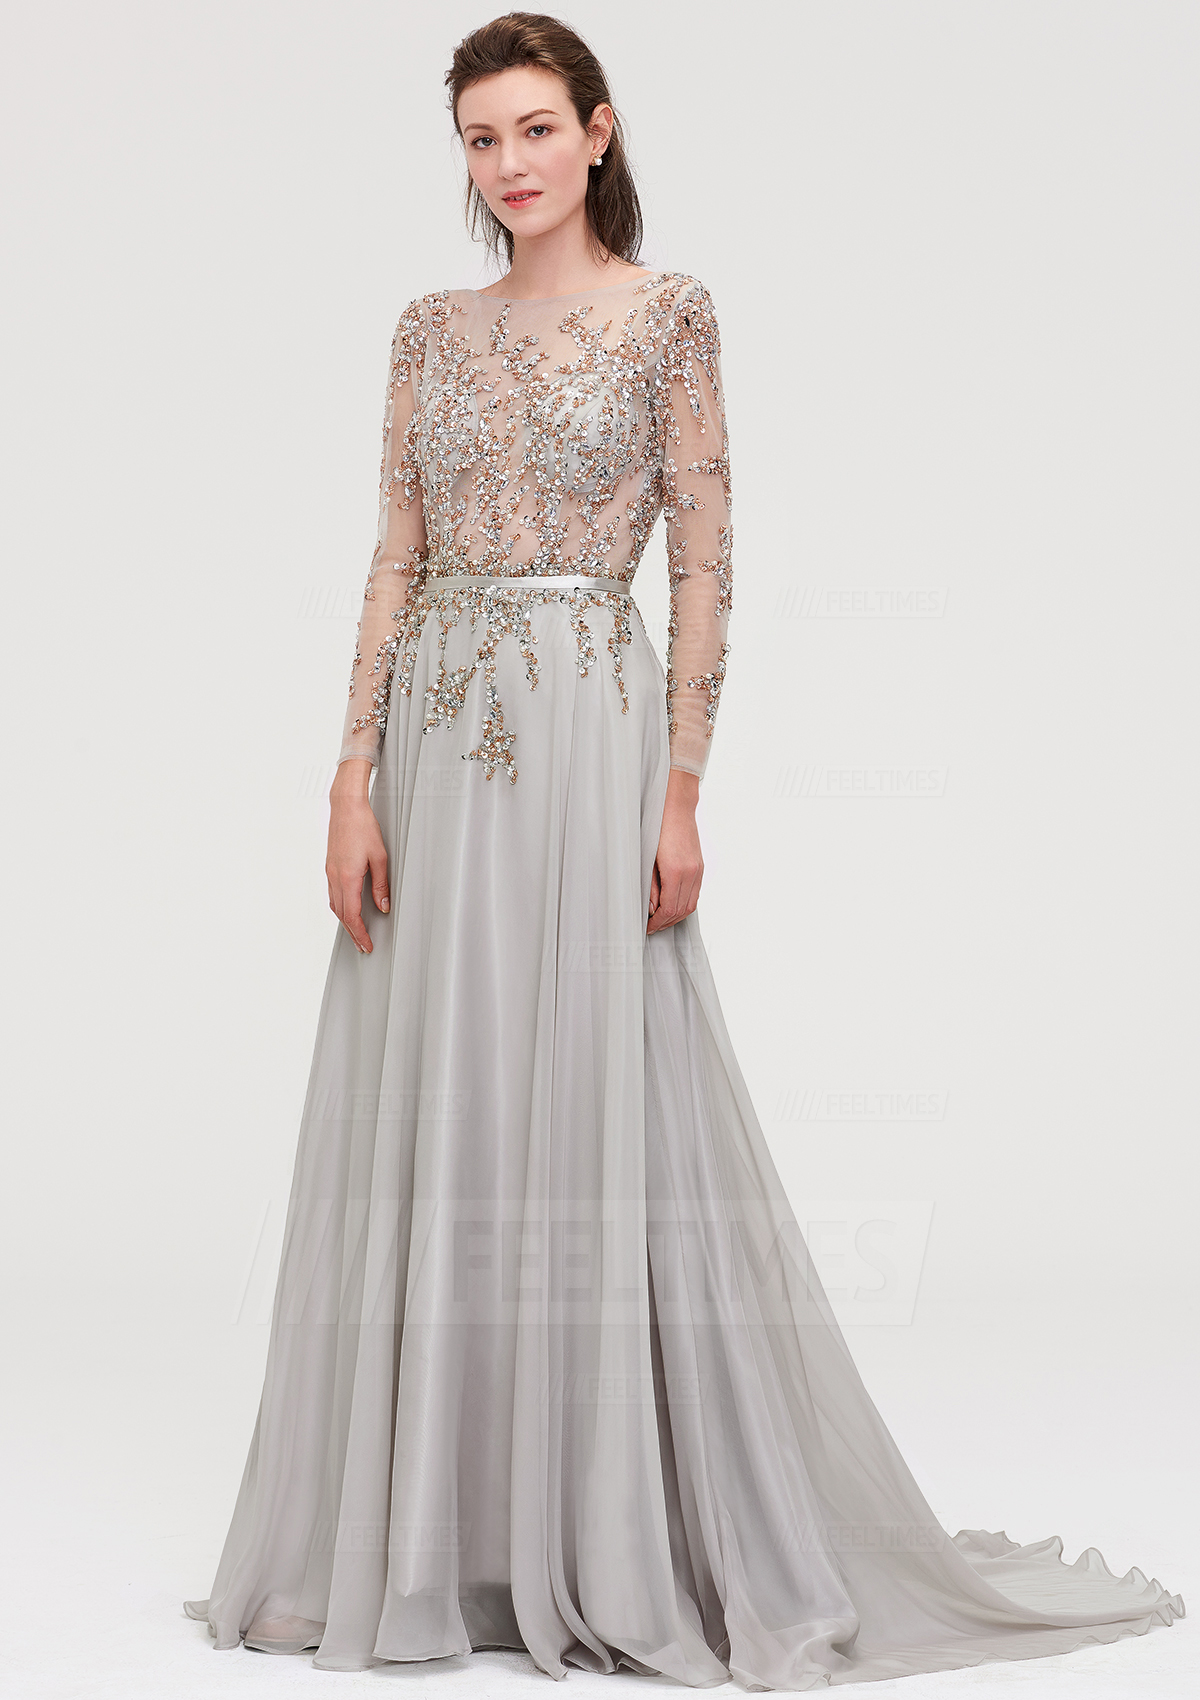 d7eea8753090 A-Line/Princess Bateau Full/Long Sleeve Court Train Chiffon Prom Dress With  Beading